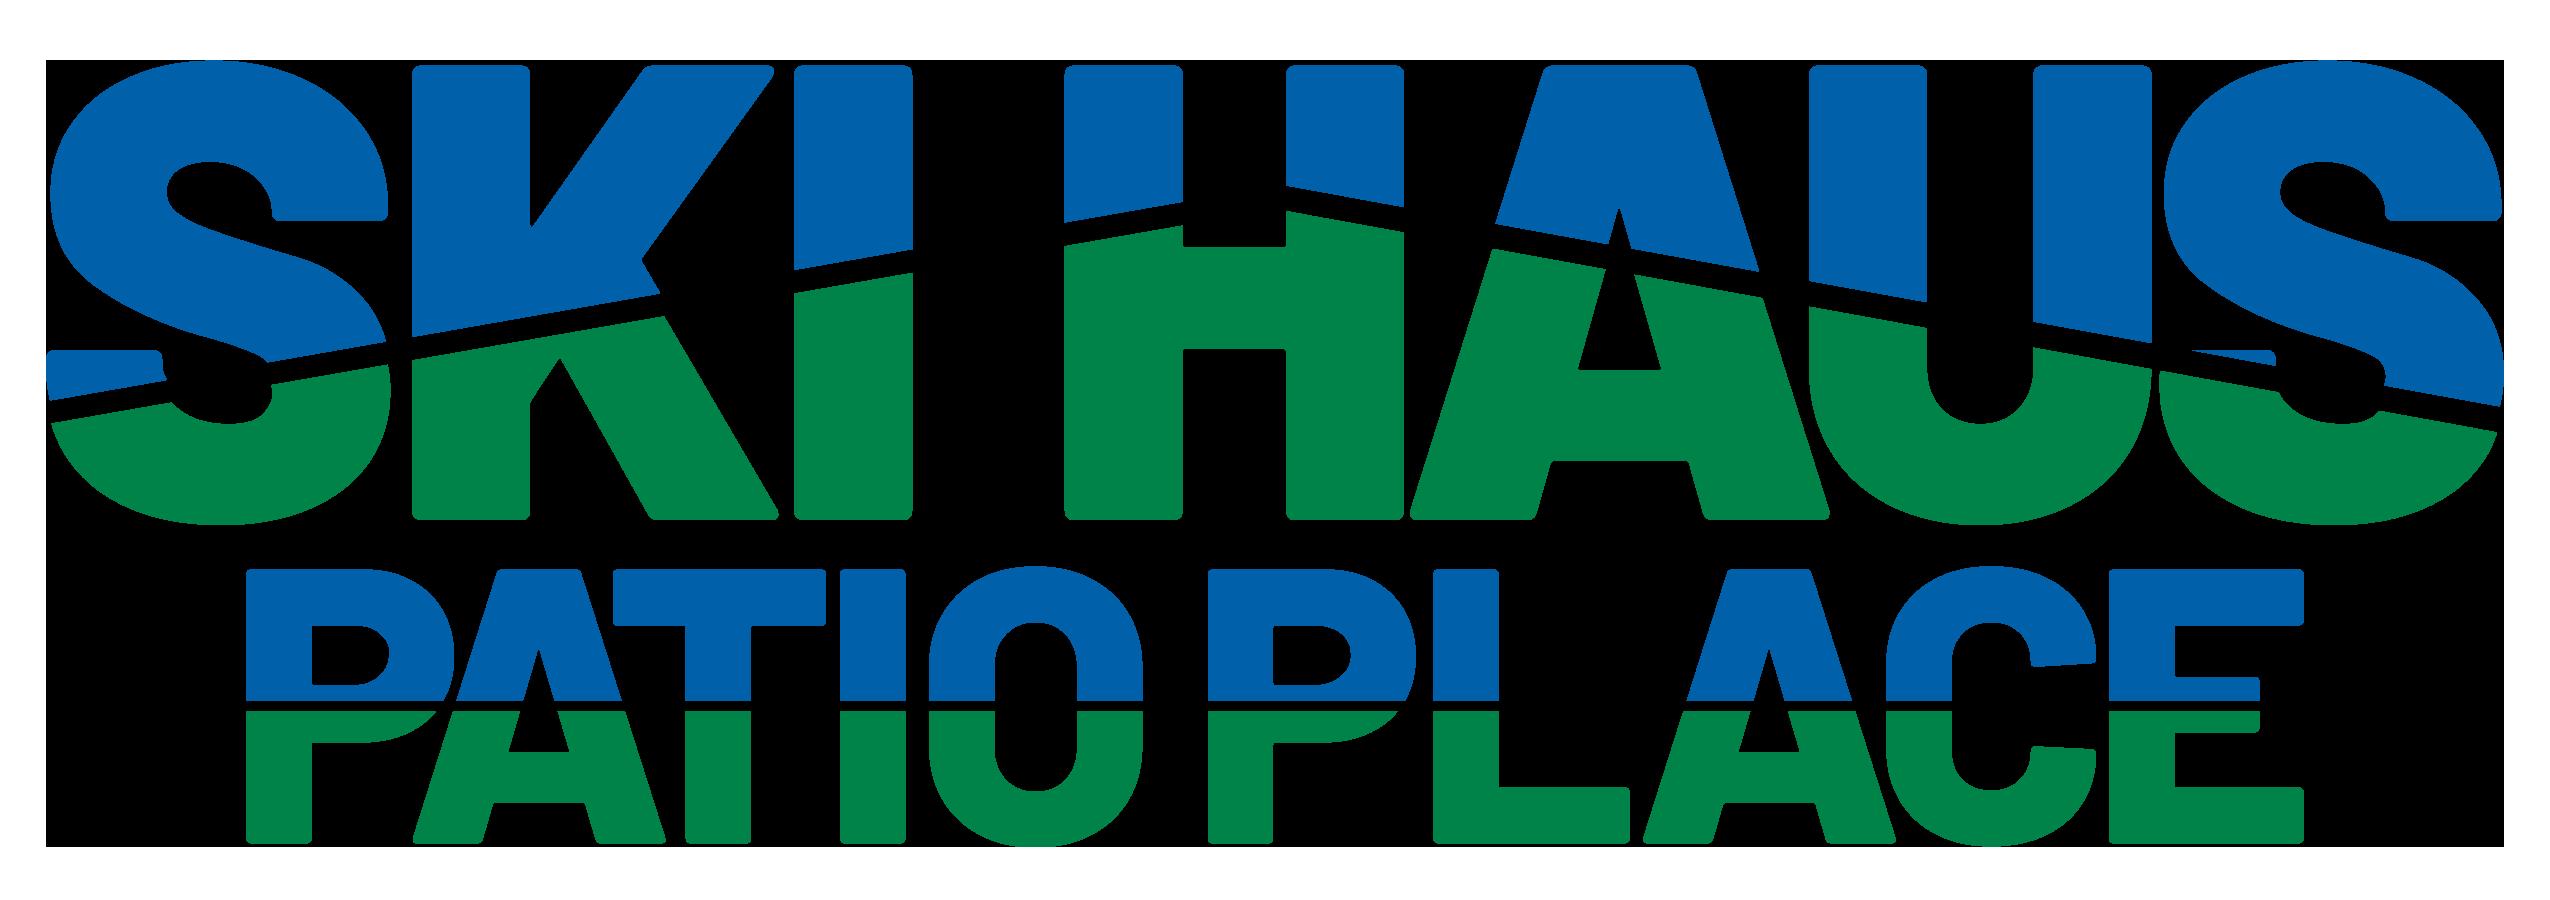 ppsh20-logo-yt-trans.png